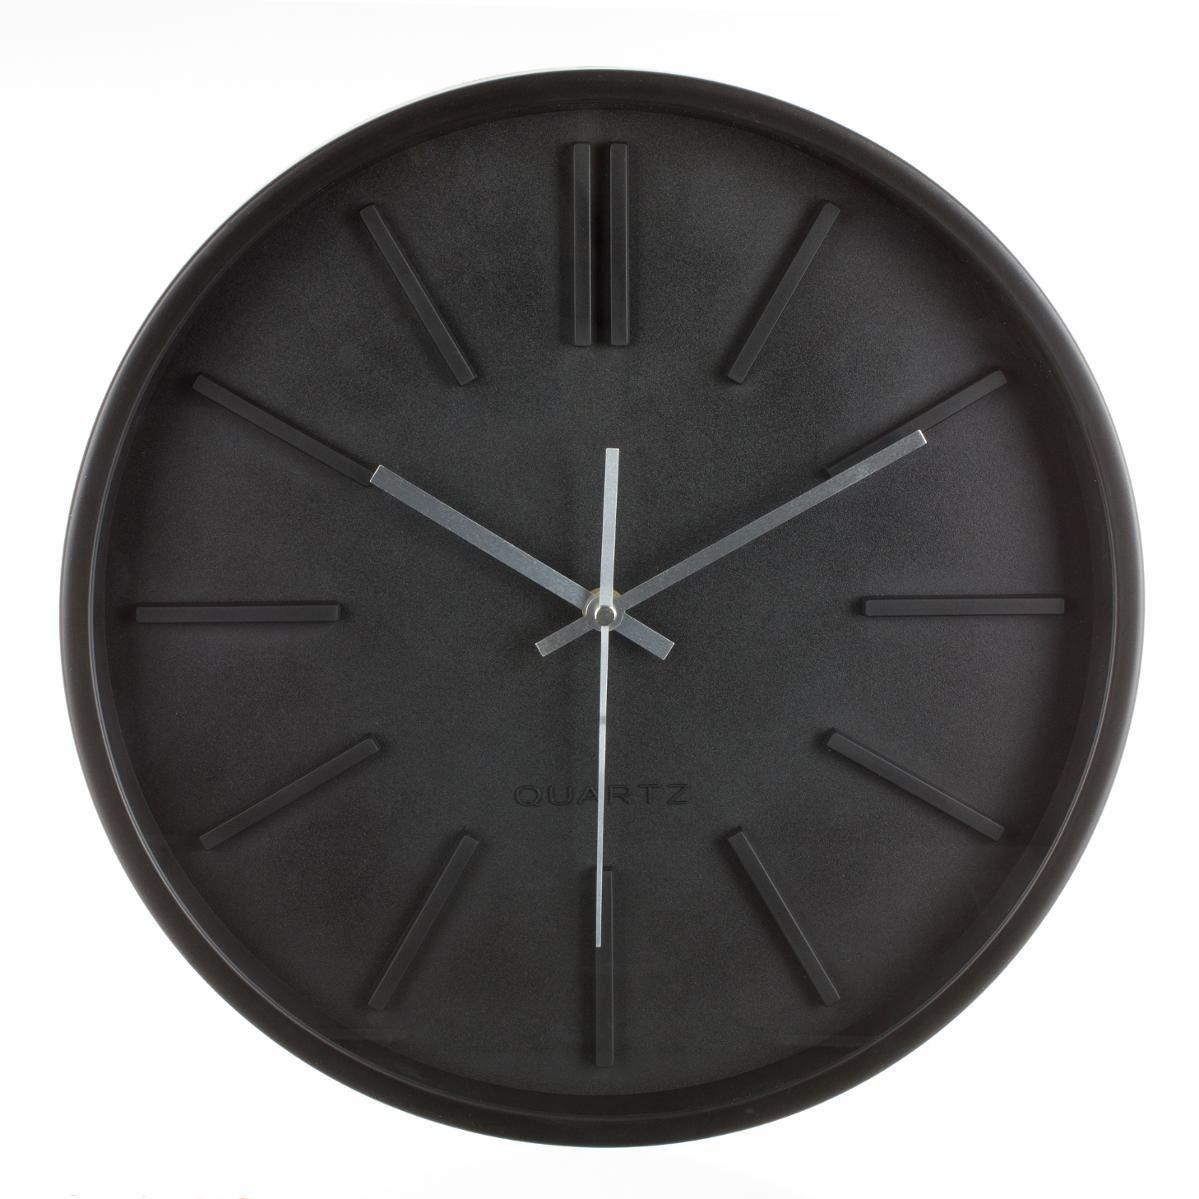 Okragly Czarny Zegar Scienny 35 Cm Quartz 7300655900 Oficjalne Archiwum Allegro Wall Clock Clock Home Decor